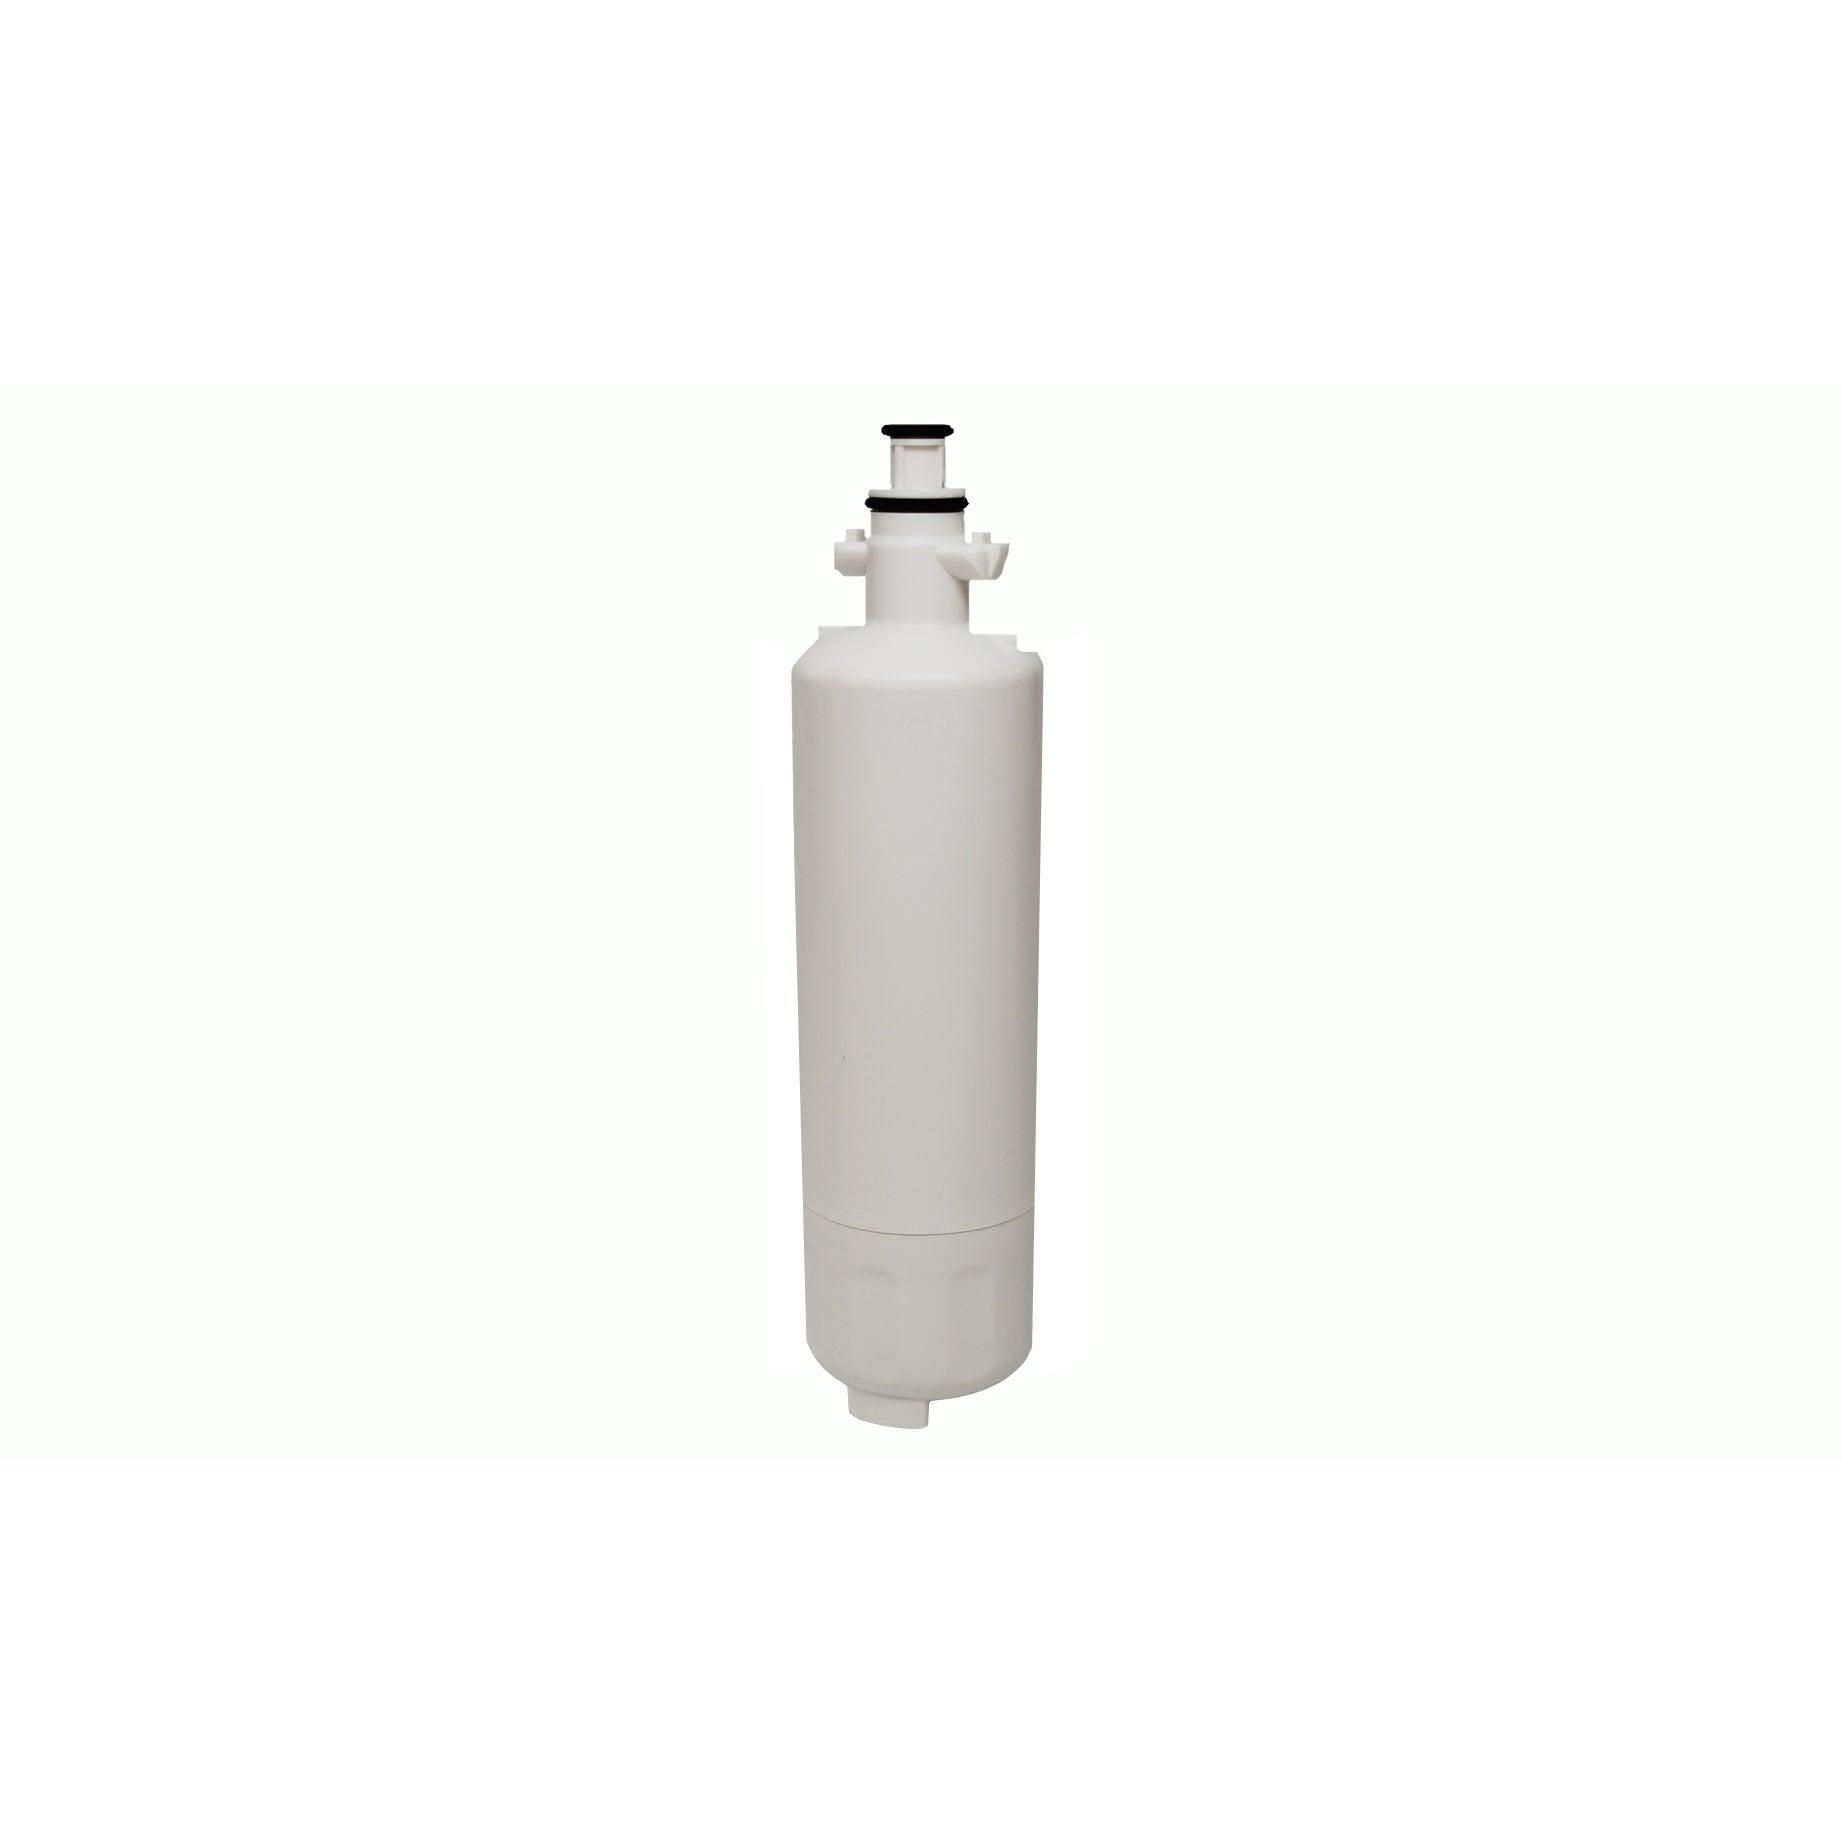 Crucial LG LT700P (RFC1200A) Refrigerator Water Purifier ...